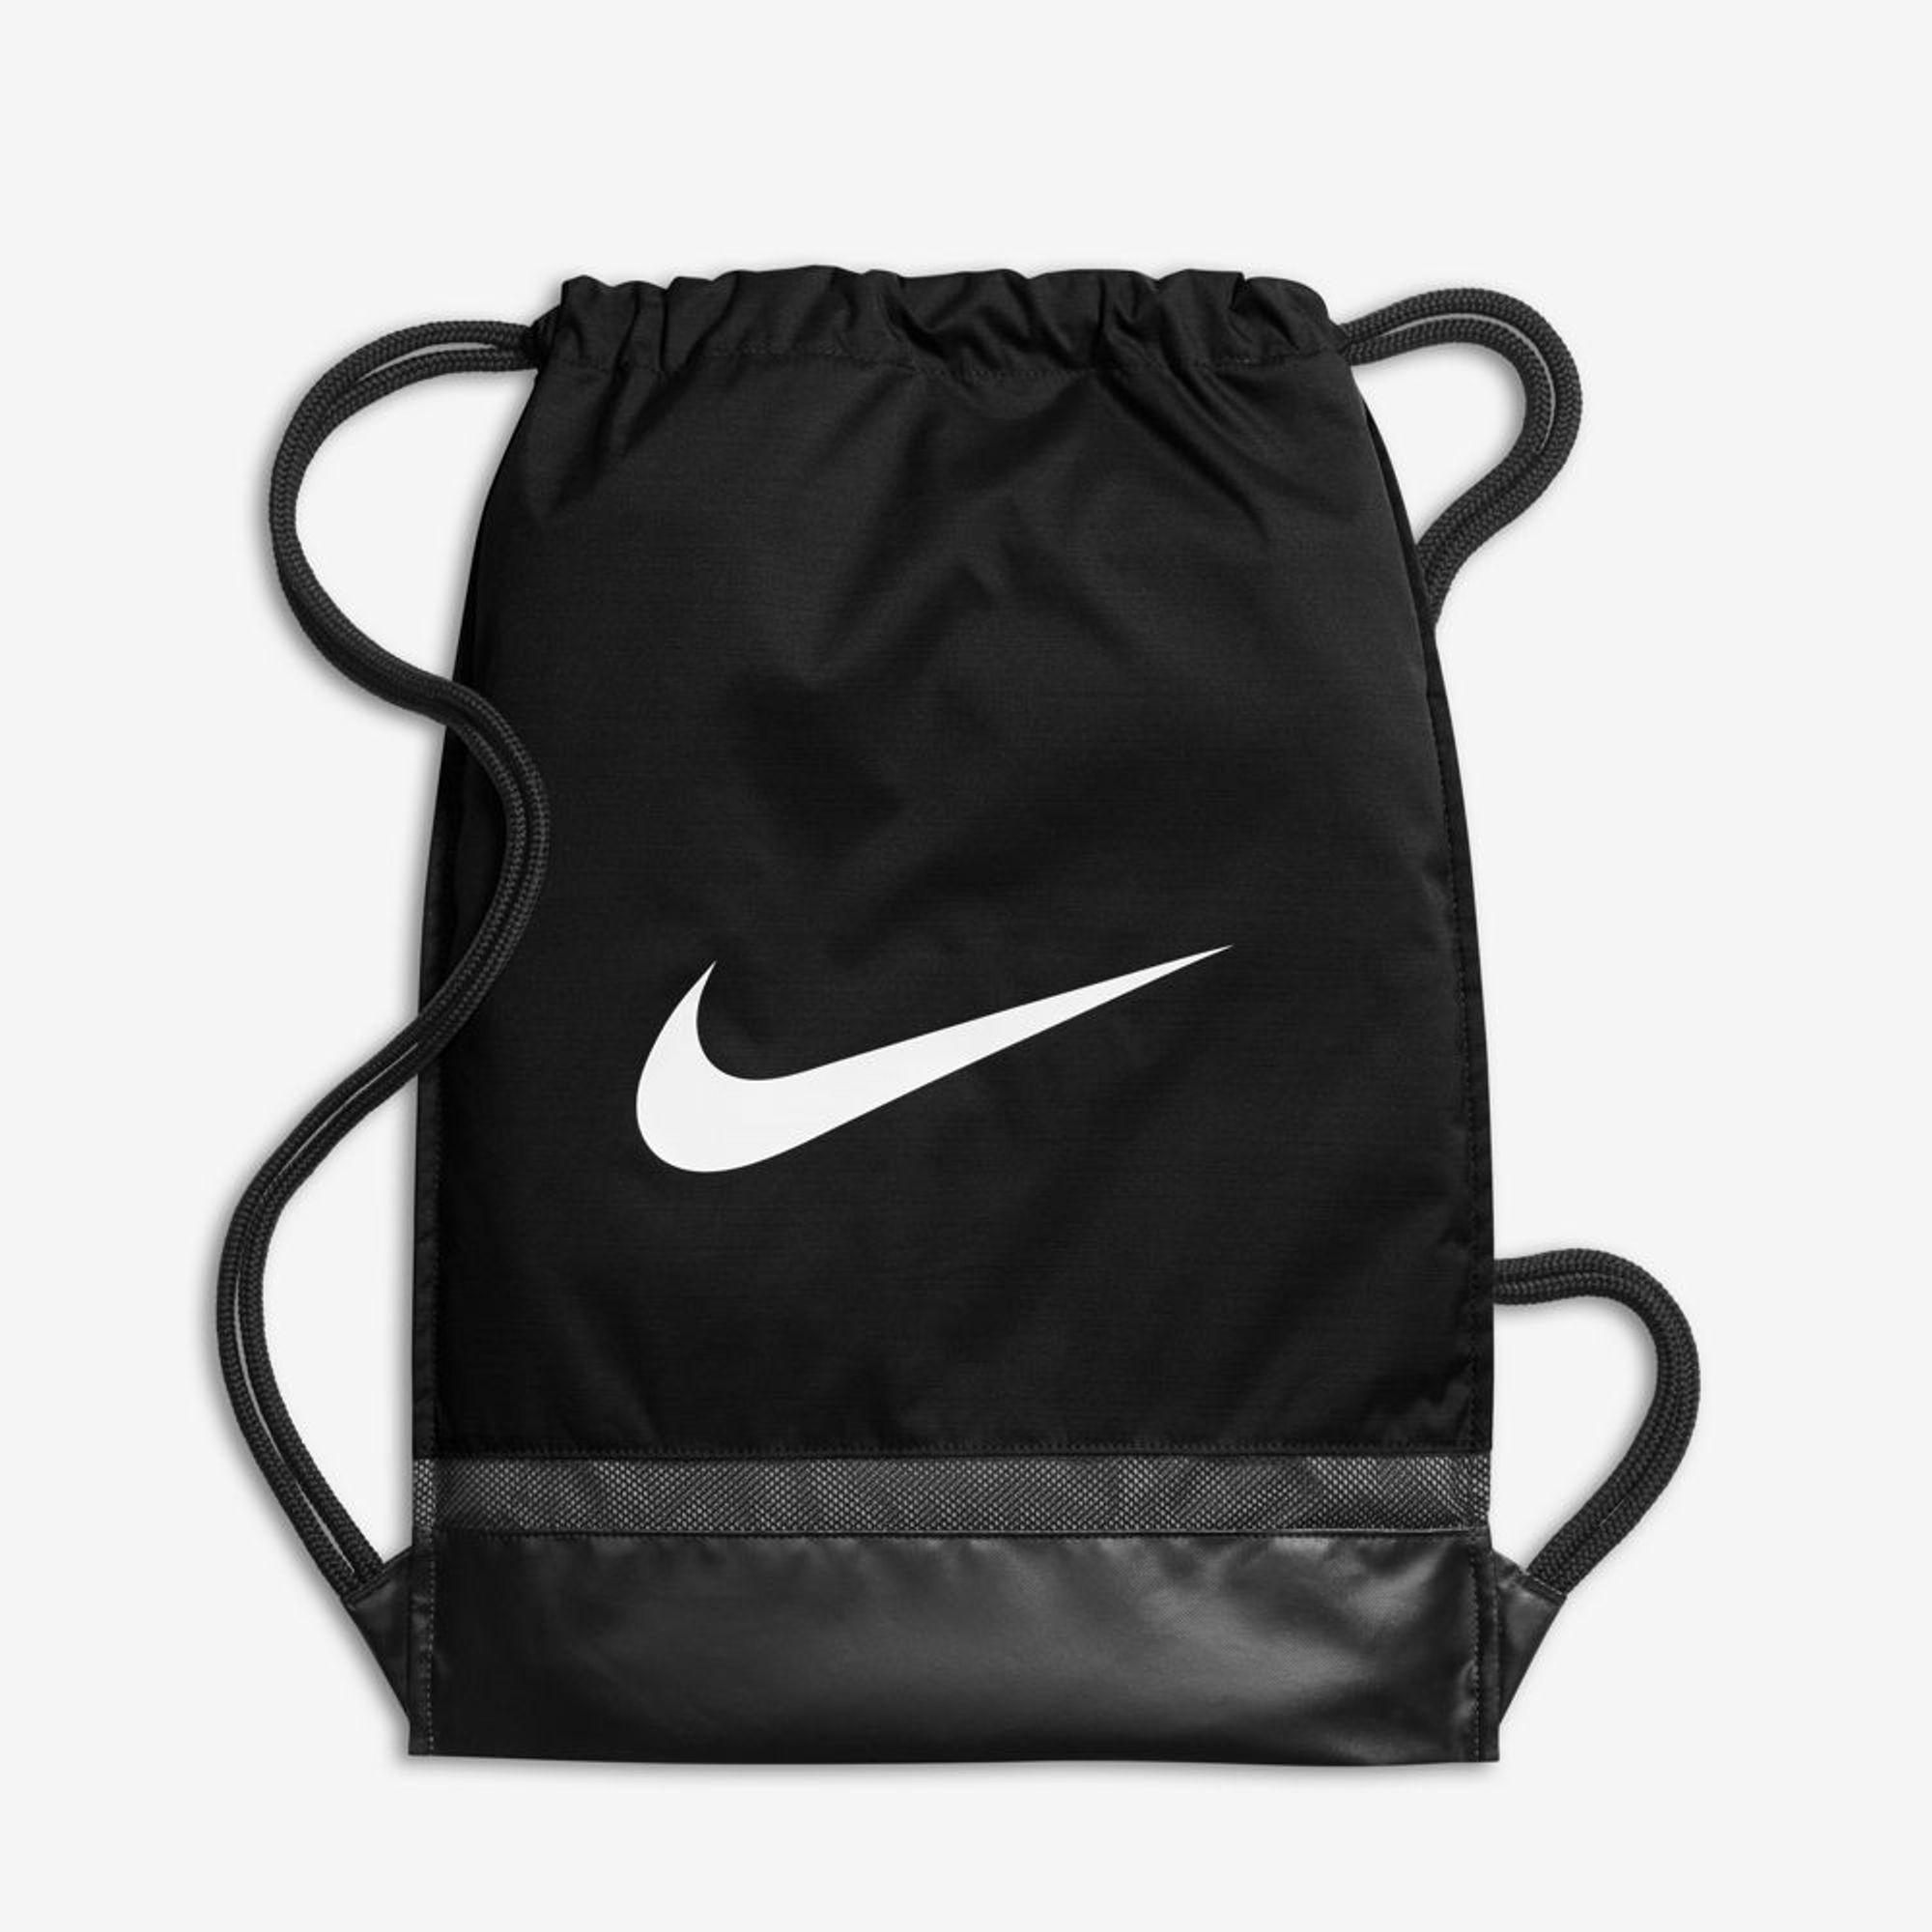 Nike Nk Brsla Gmsk - black/black/white